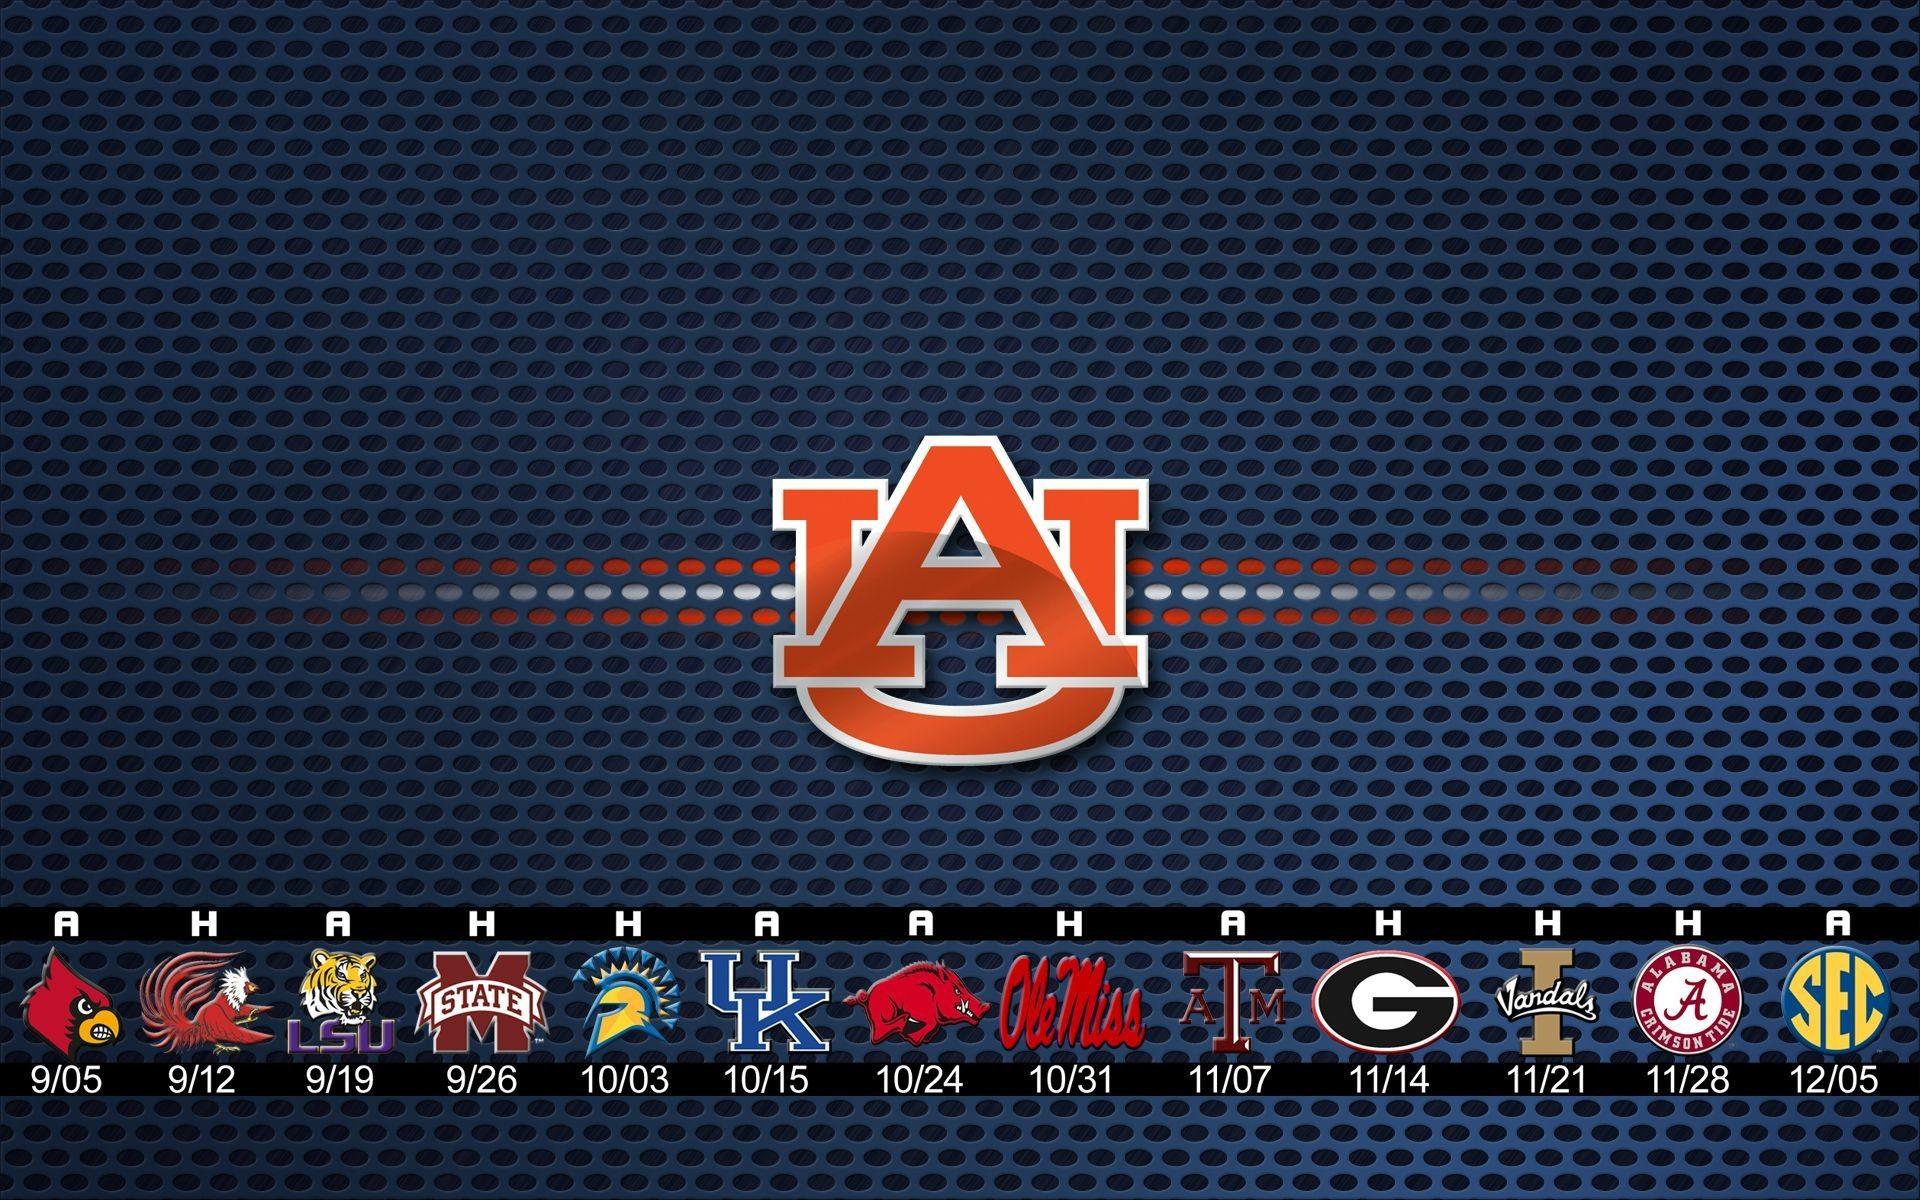 Auburn Tigers Football 2015 Schedule Wallpaper : wde